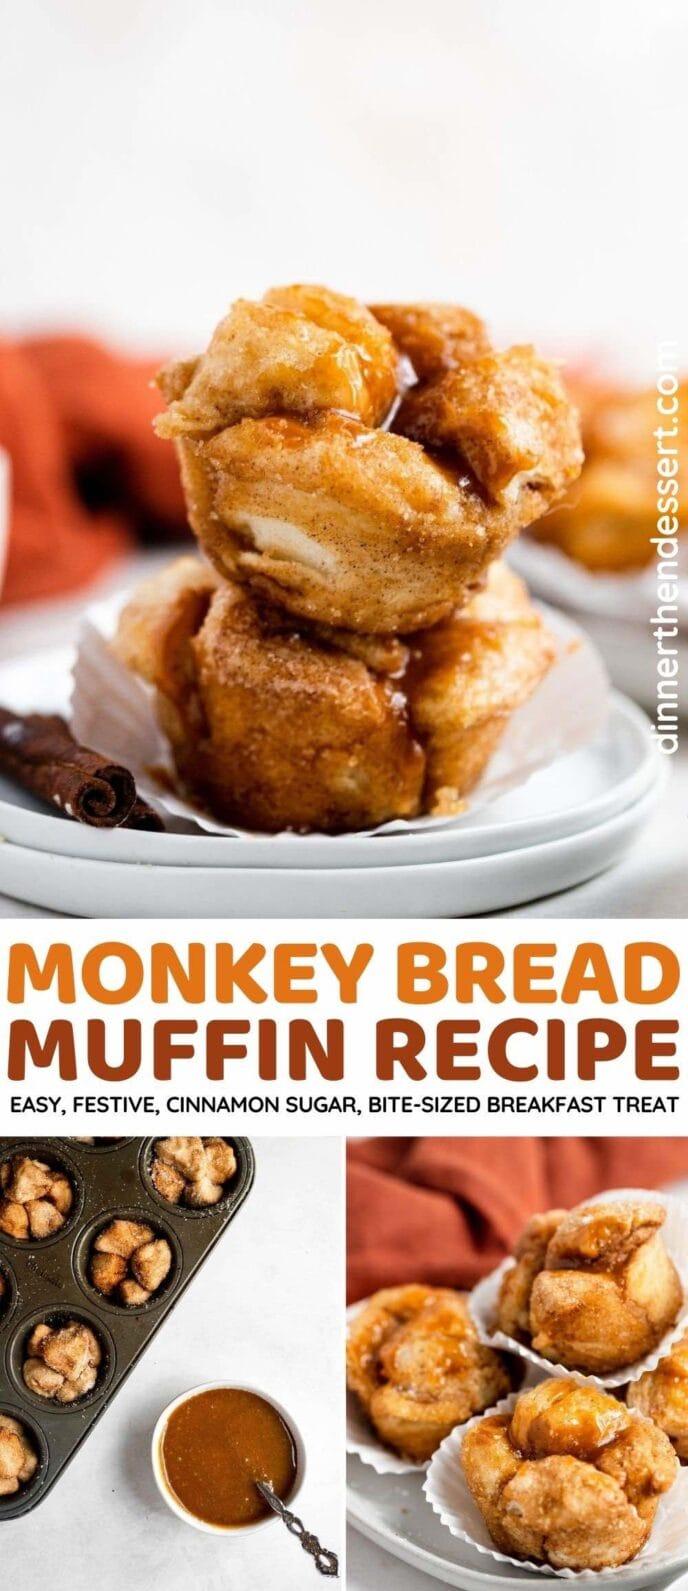 Monkey Bread Muffins collage